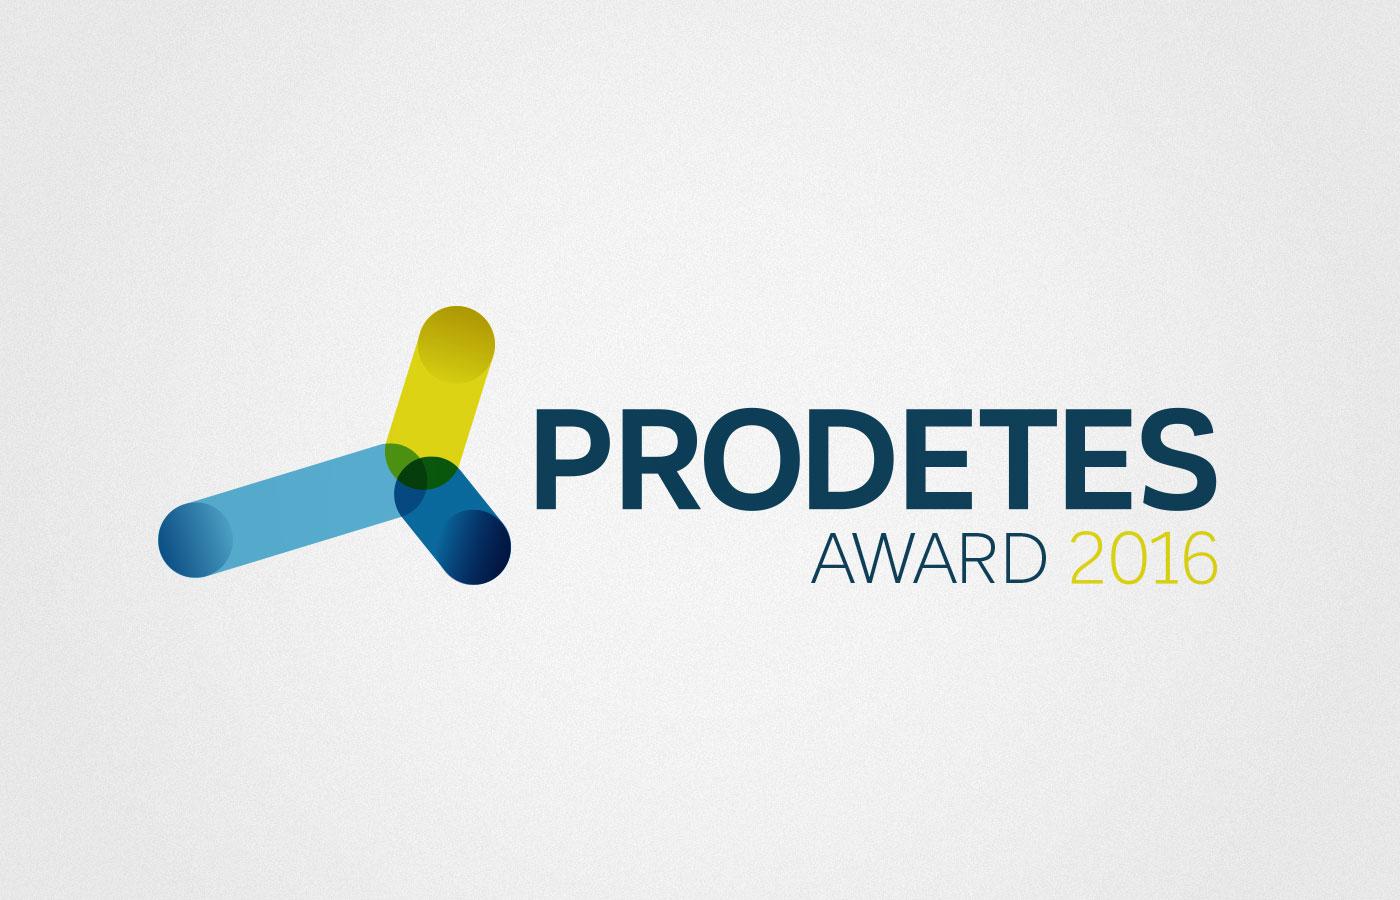 Prodetes_01